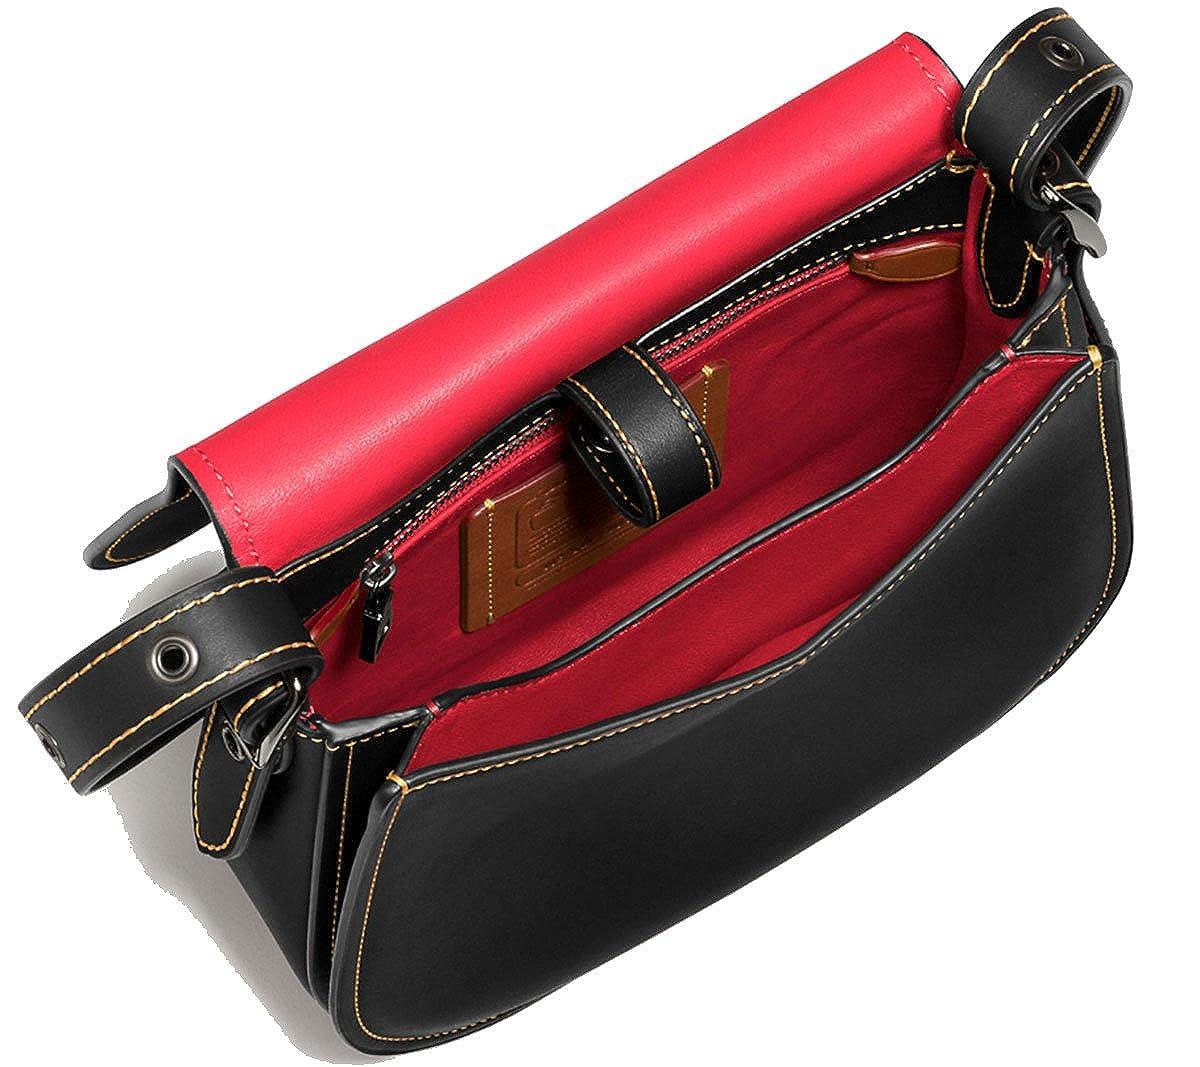 f203d28d Disney x Coach Mickey Mouse Saddle Bag 23: Amazon.ca: Shoes & Handbags